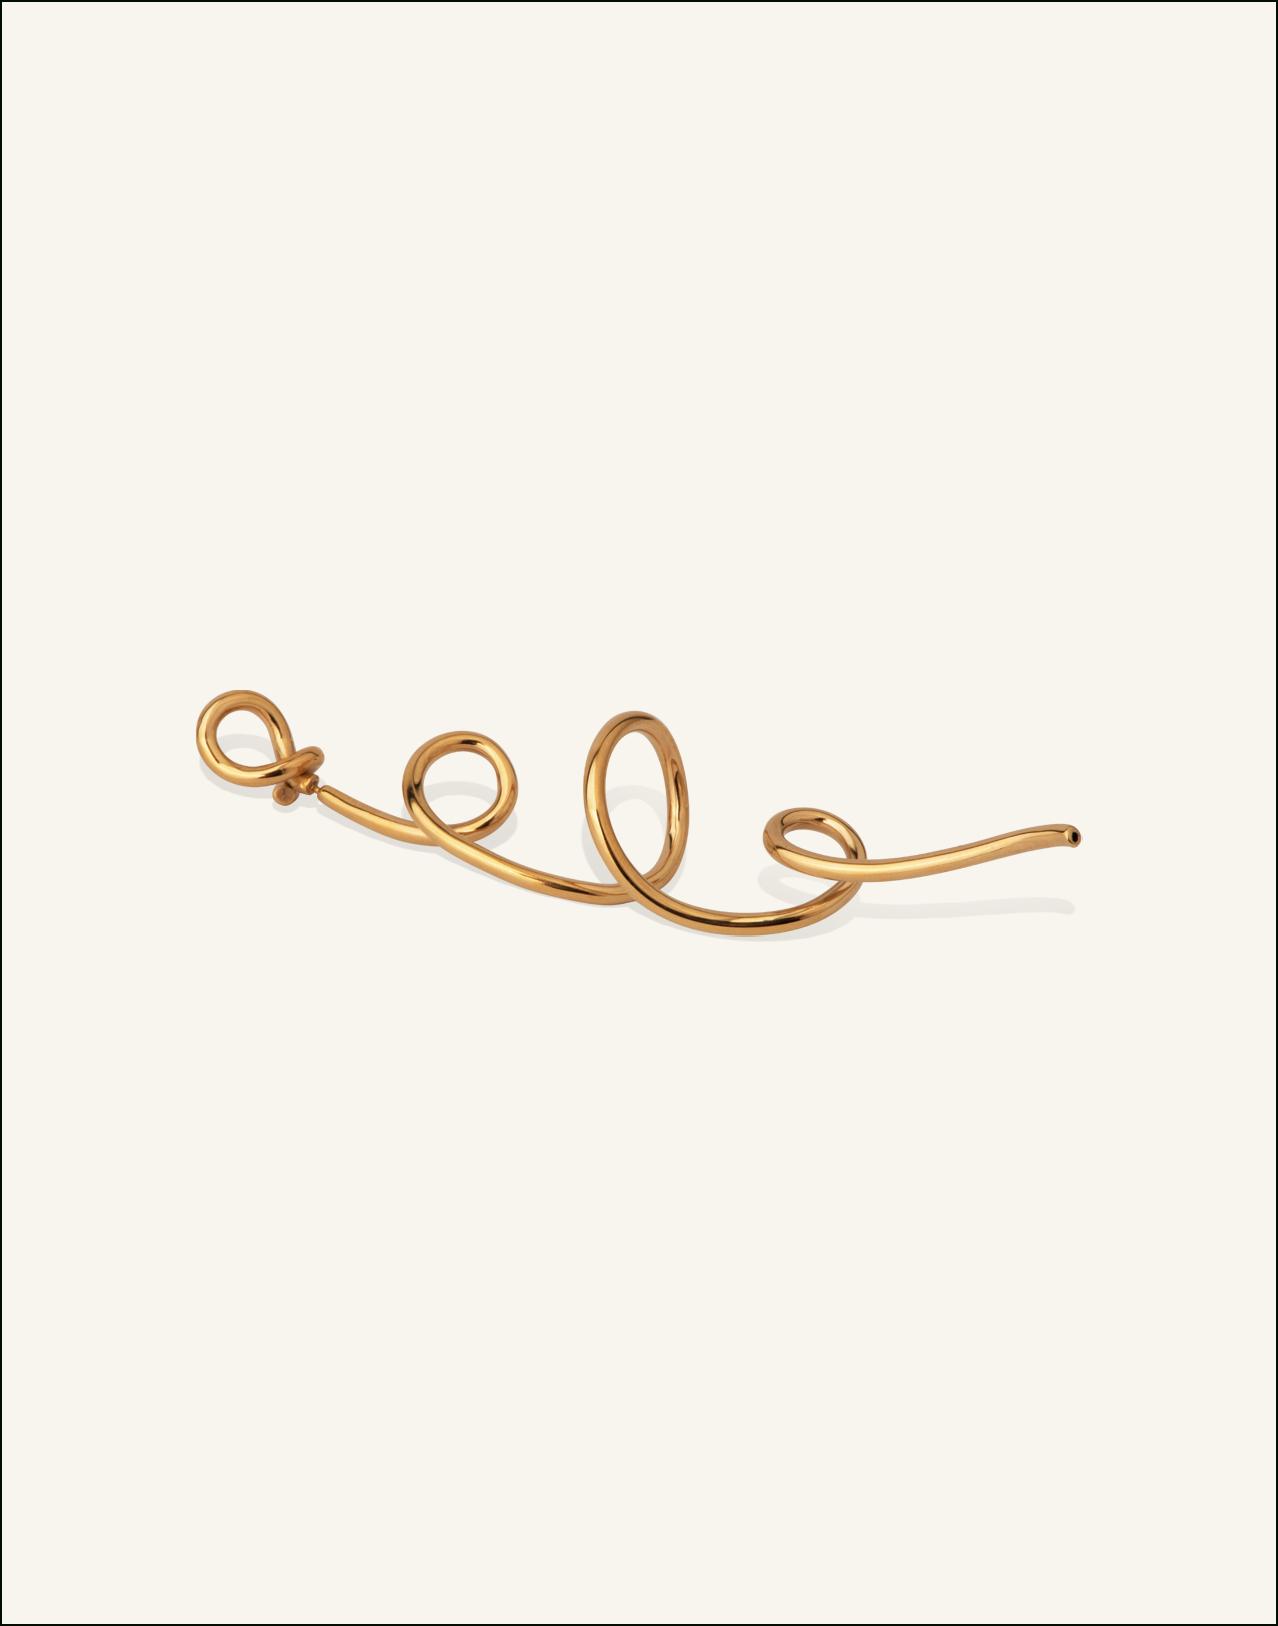 Completedworks-Earrings-Self-Portrait-4-1.jpg